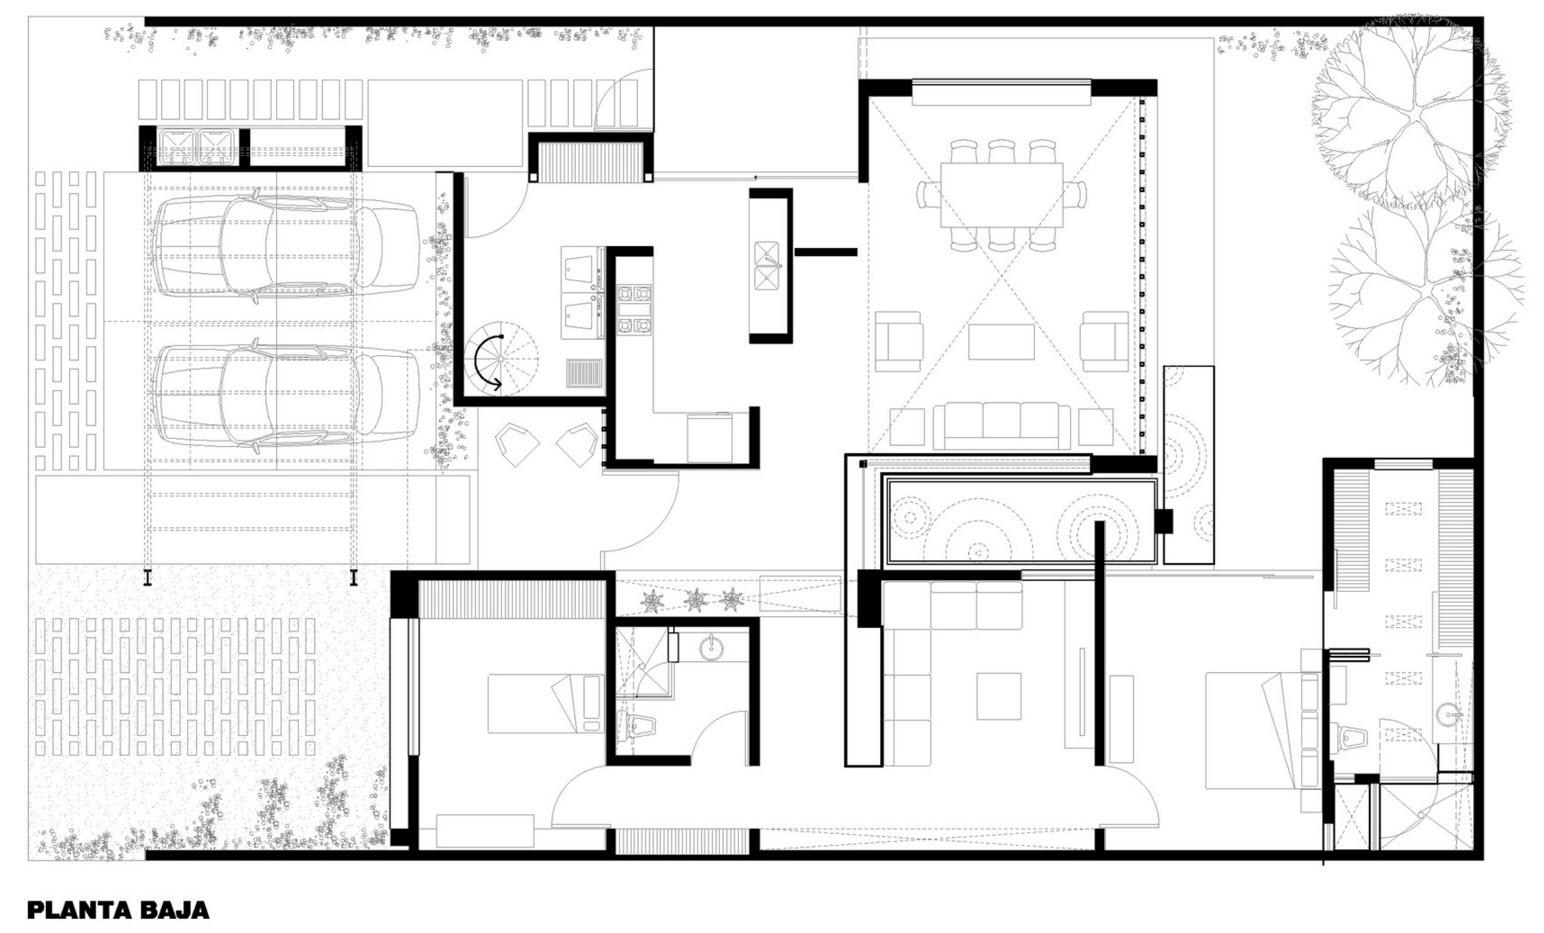 diseño casa moderna de un piso | construye hogar